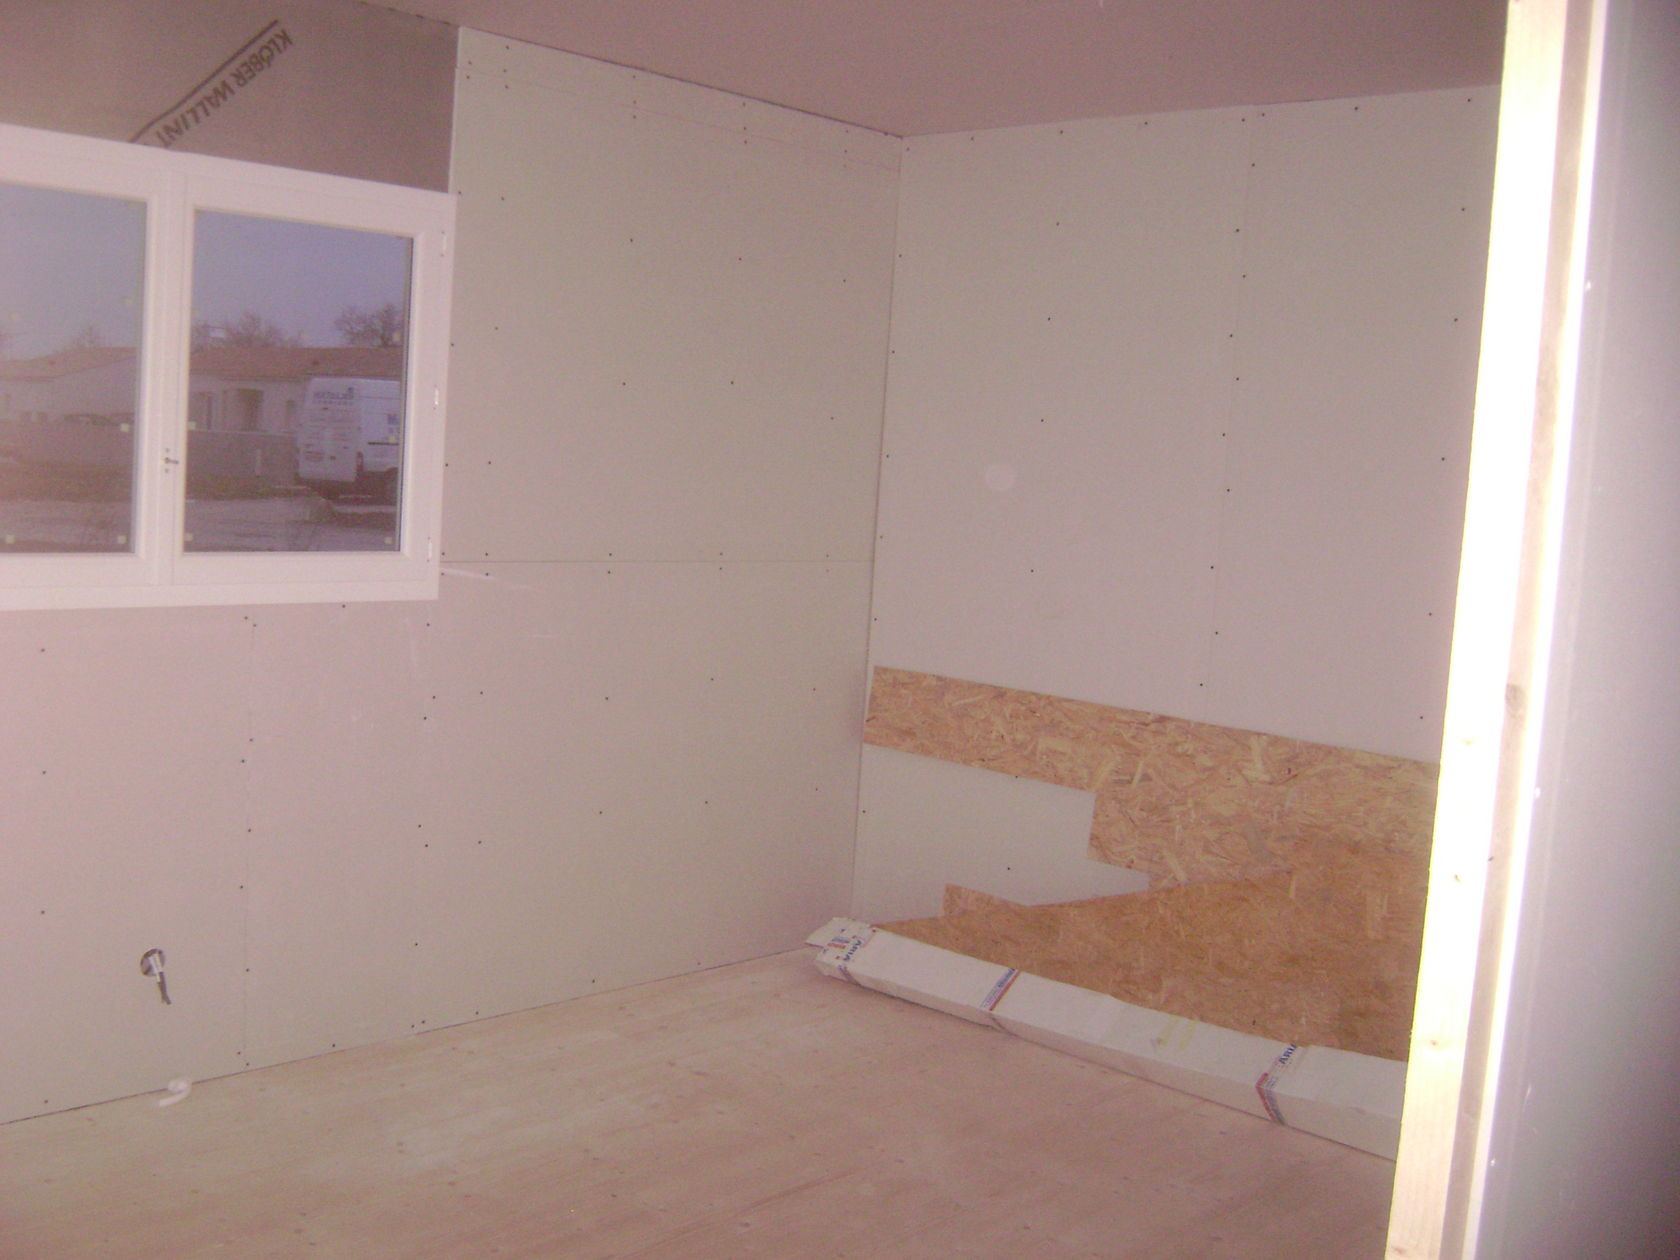 pose placo et cloison. Black Bedroom Furniture Sets. Home Design Ideas